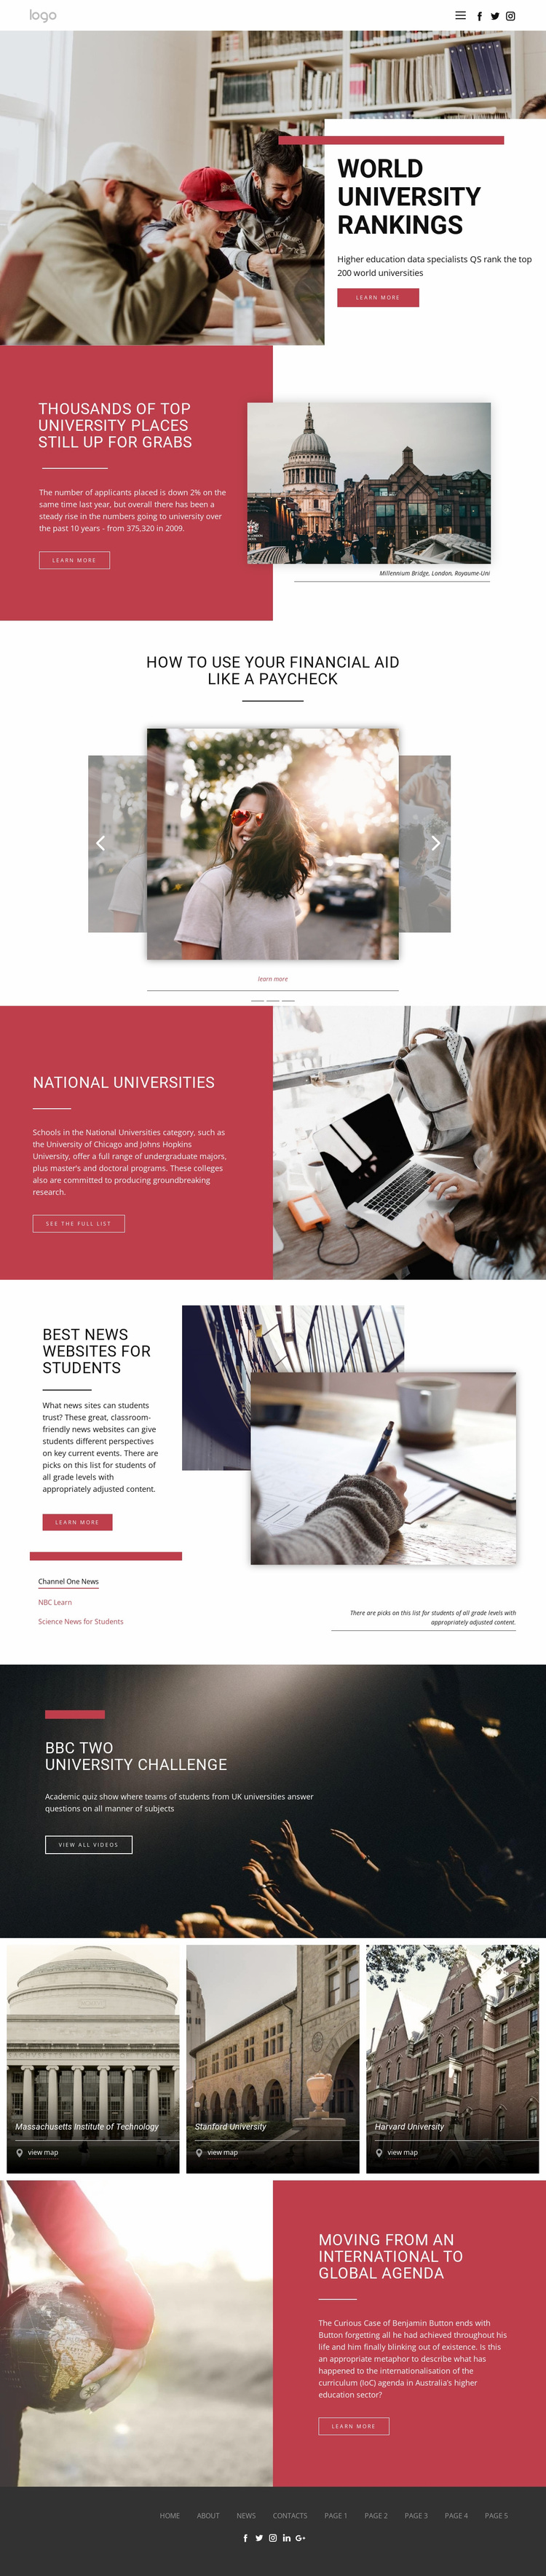 Ranking university education Website Design